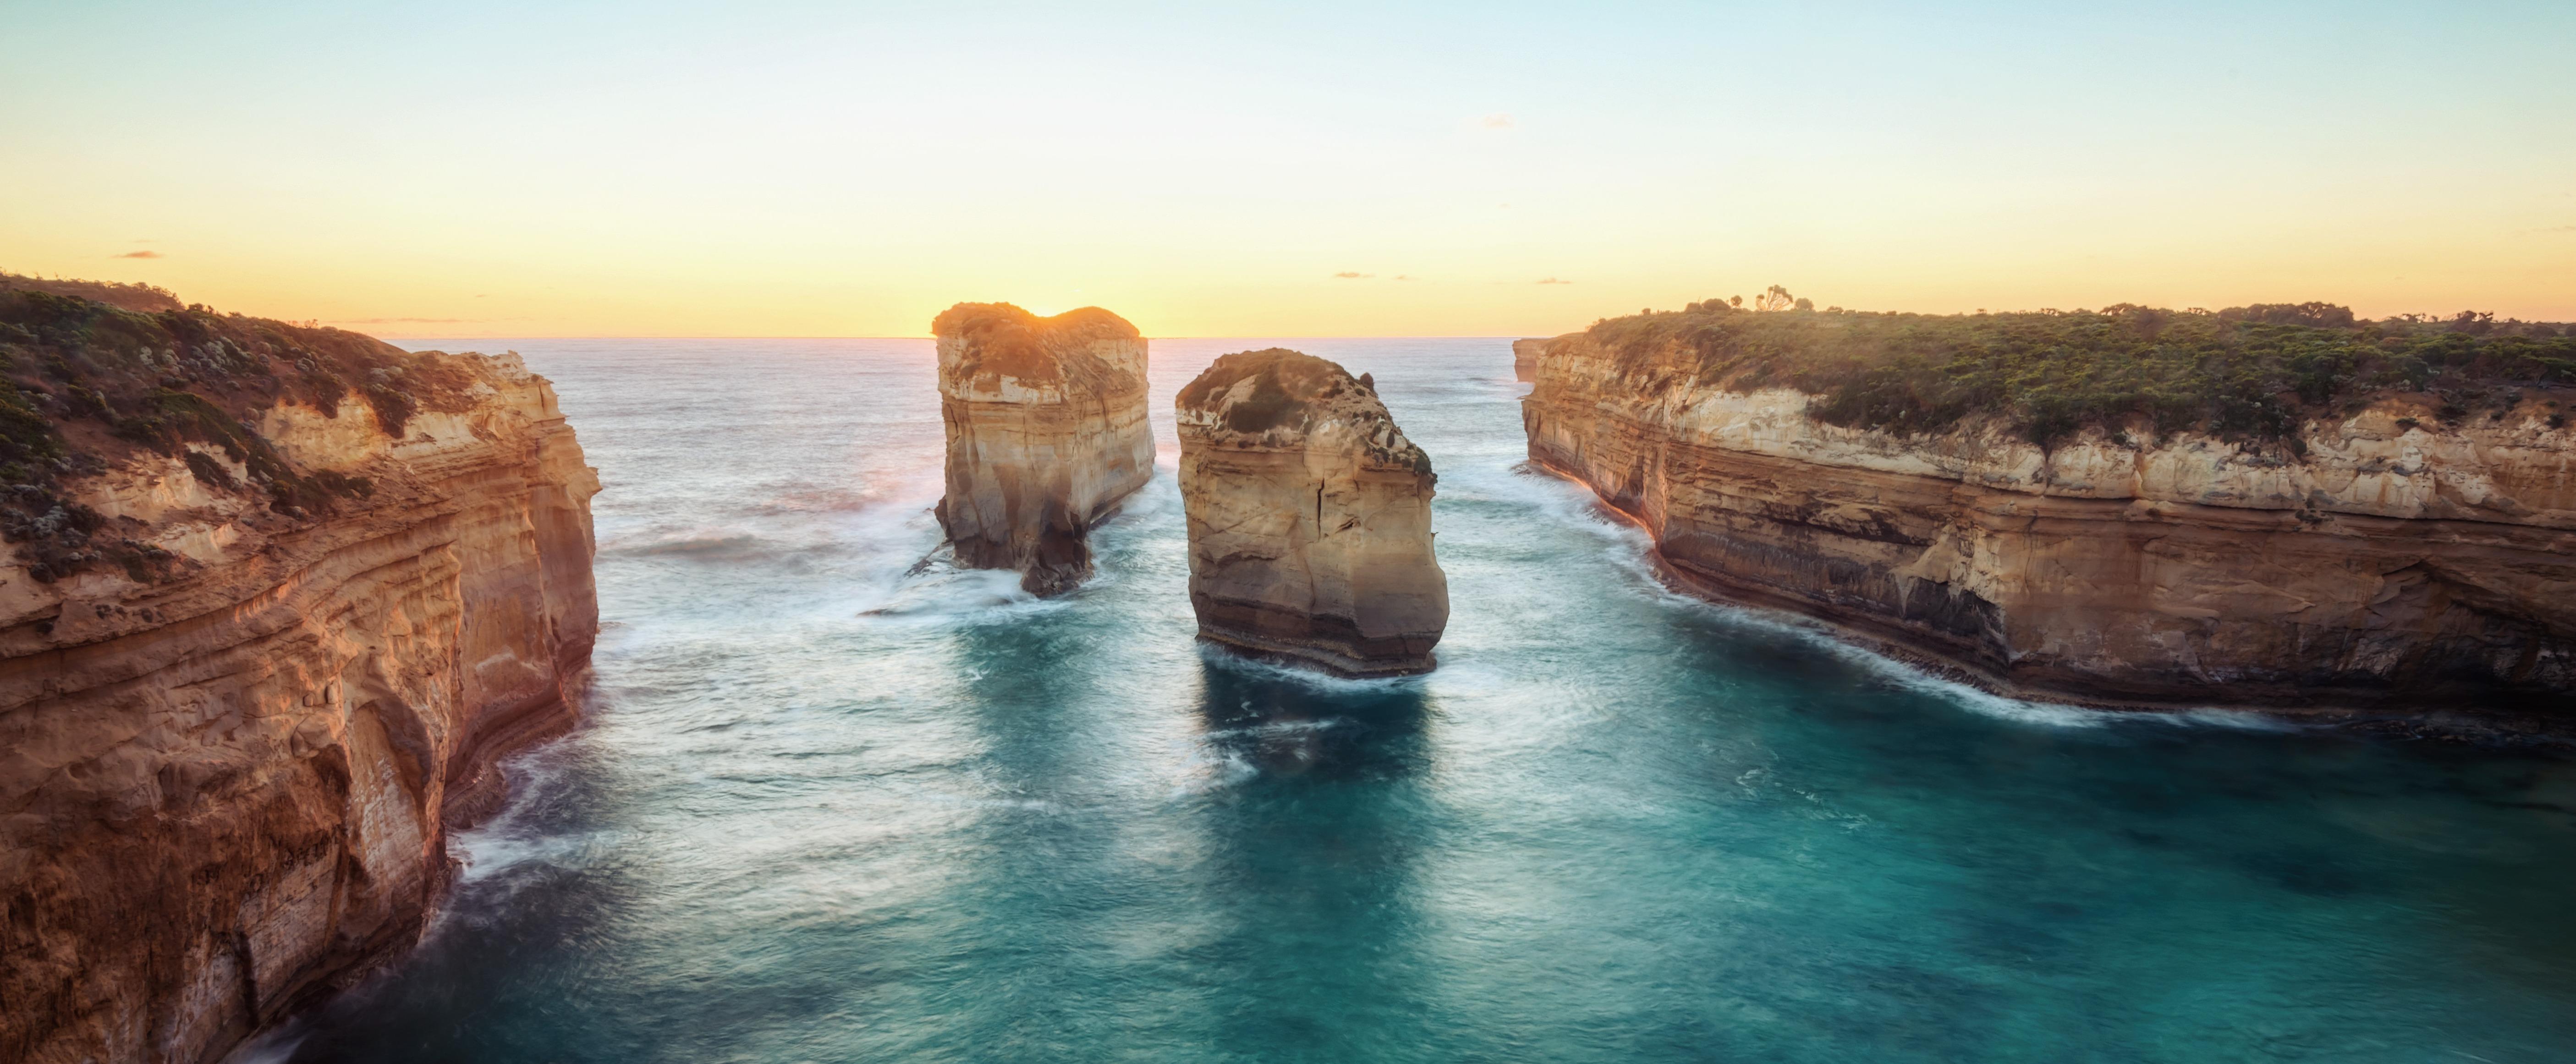 Header_Australien_VIC_Great-Ocean-Road_shutterstock_715959997